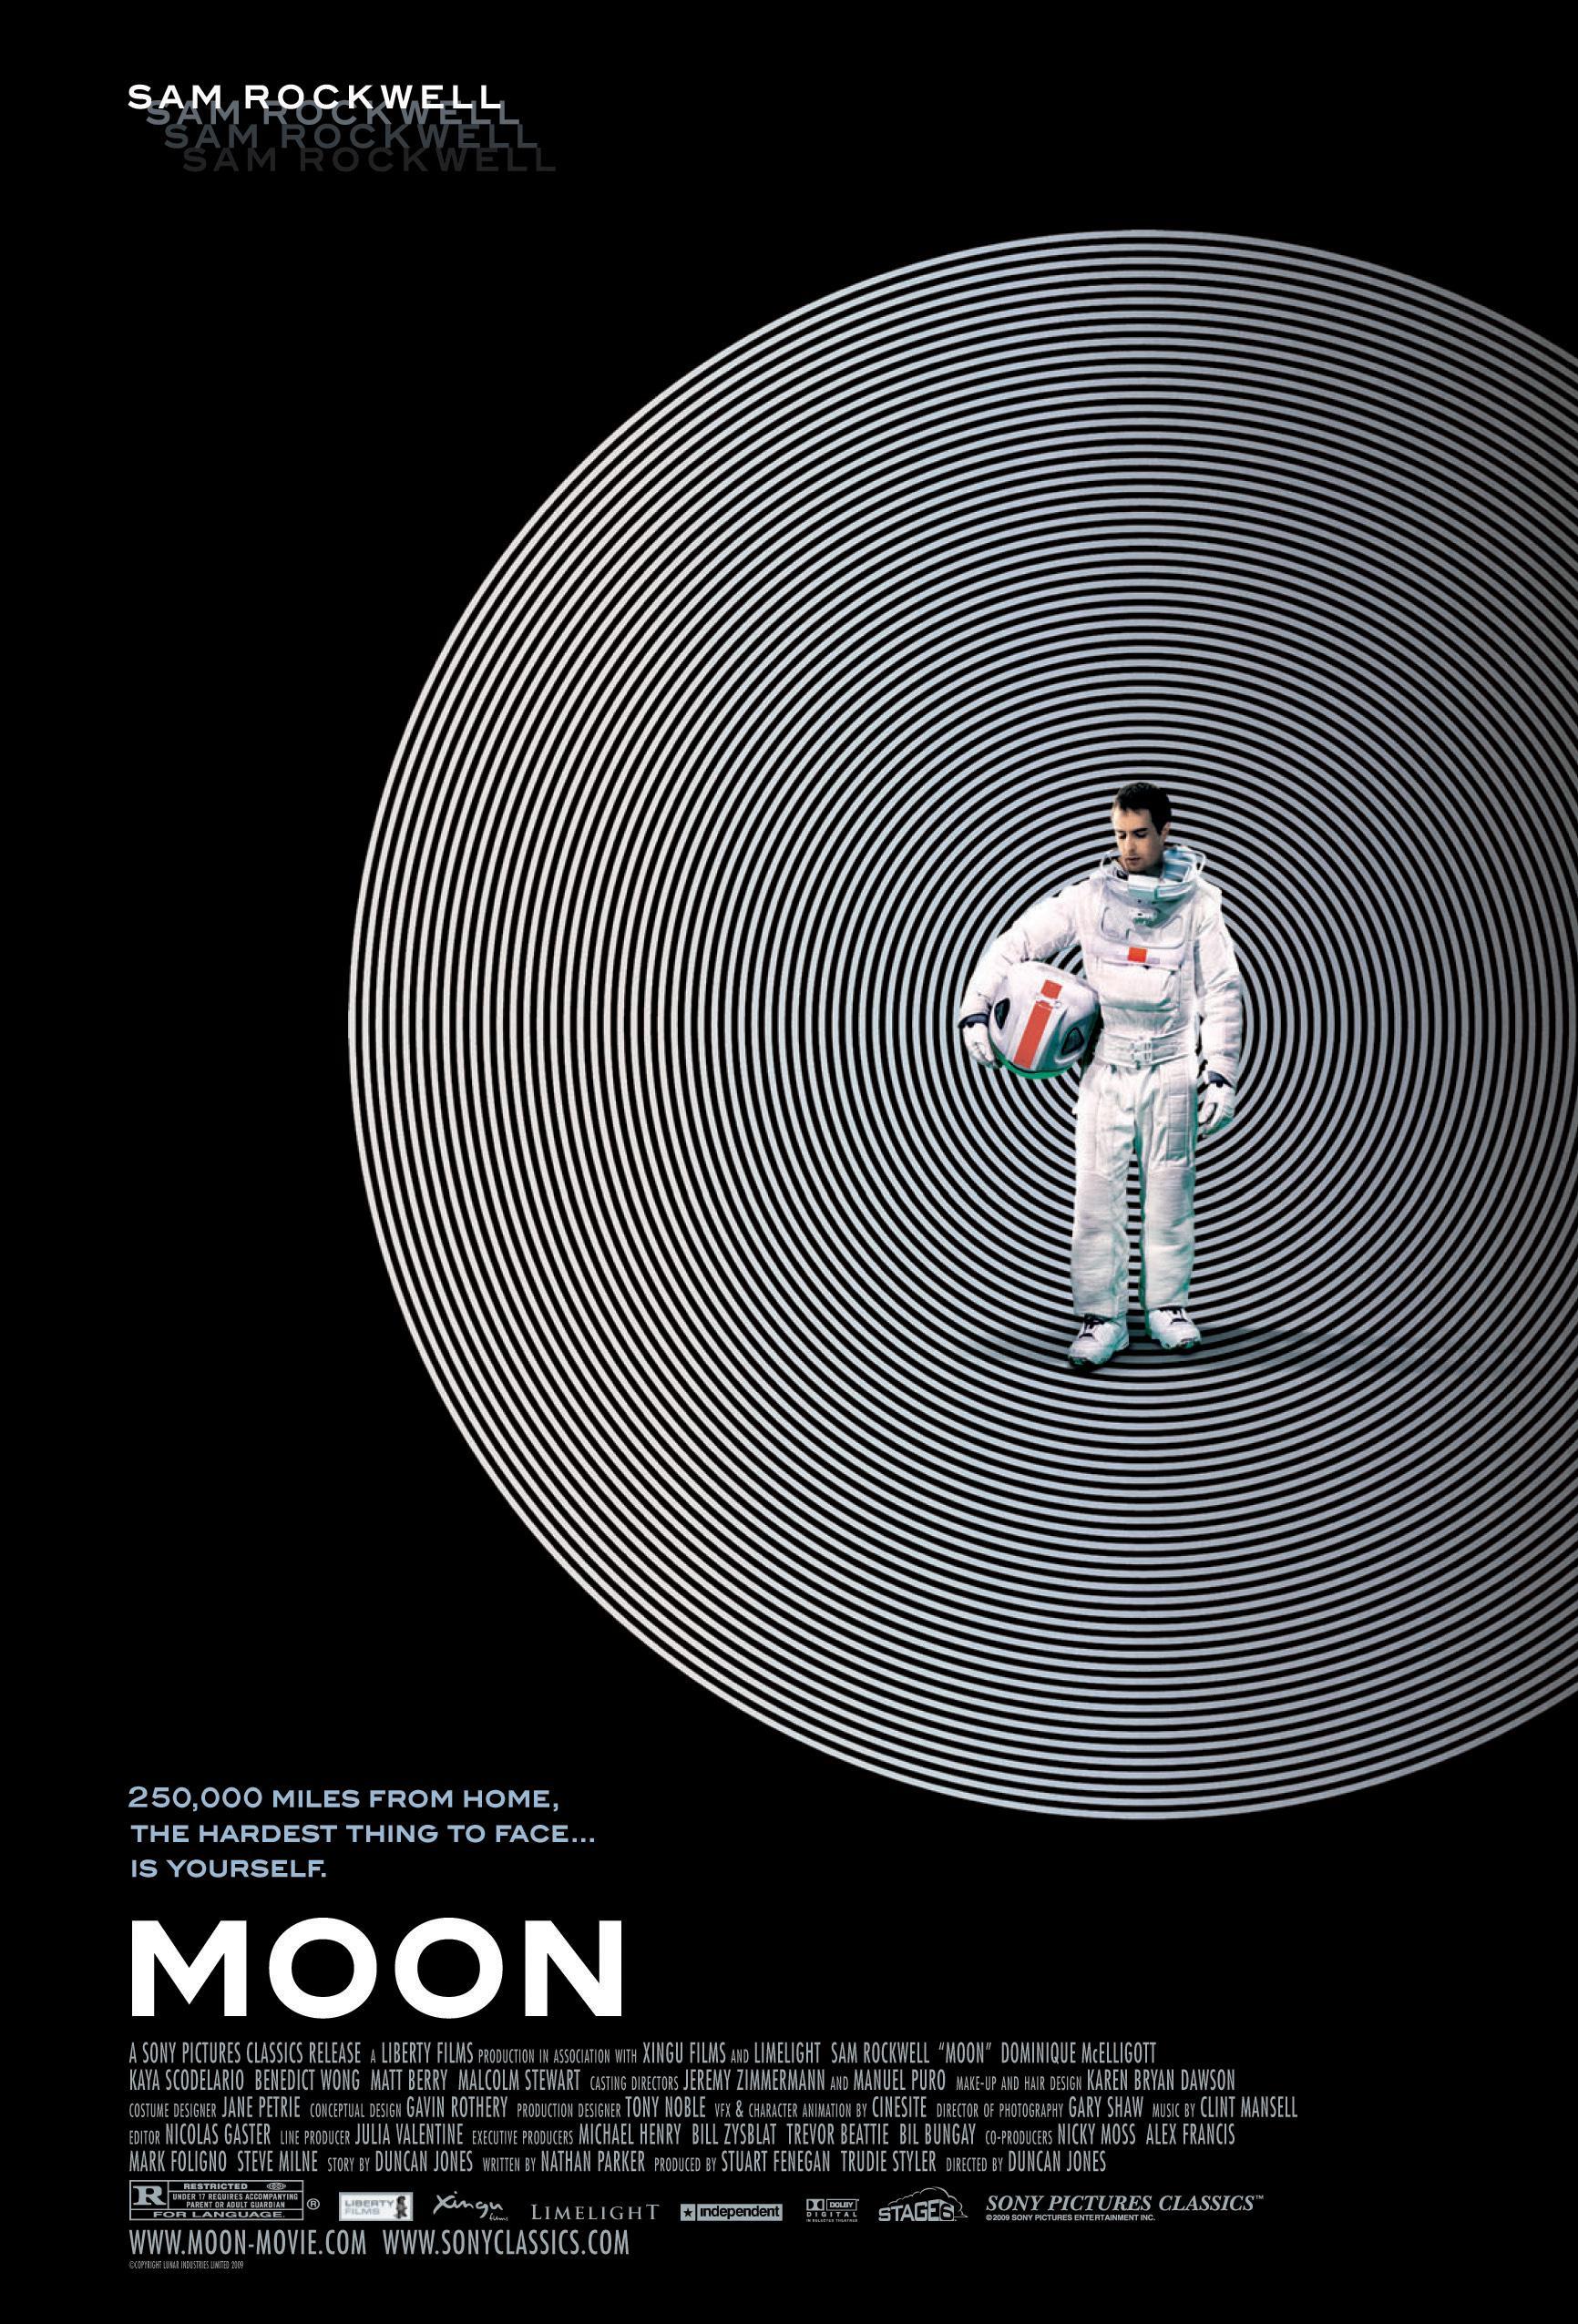 moon-poster.jpg (JPEG-Grafik, 1732×2551 Pixel) - Skaliert (24%)